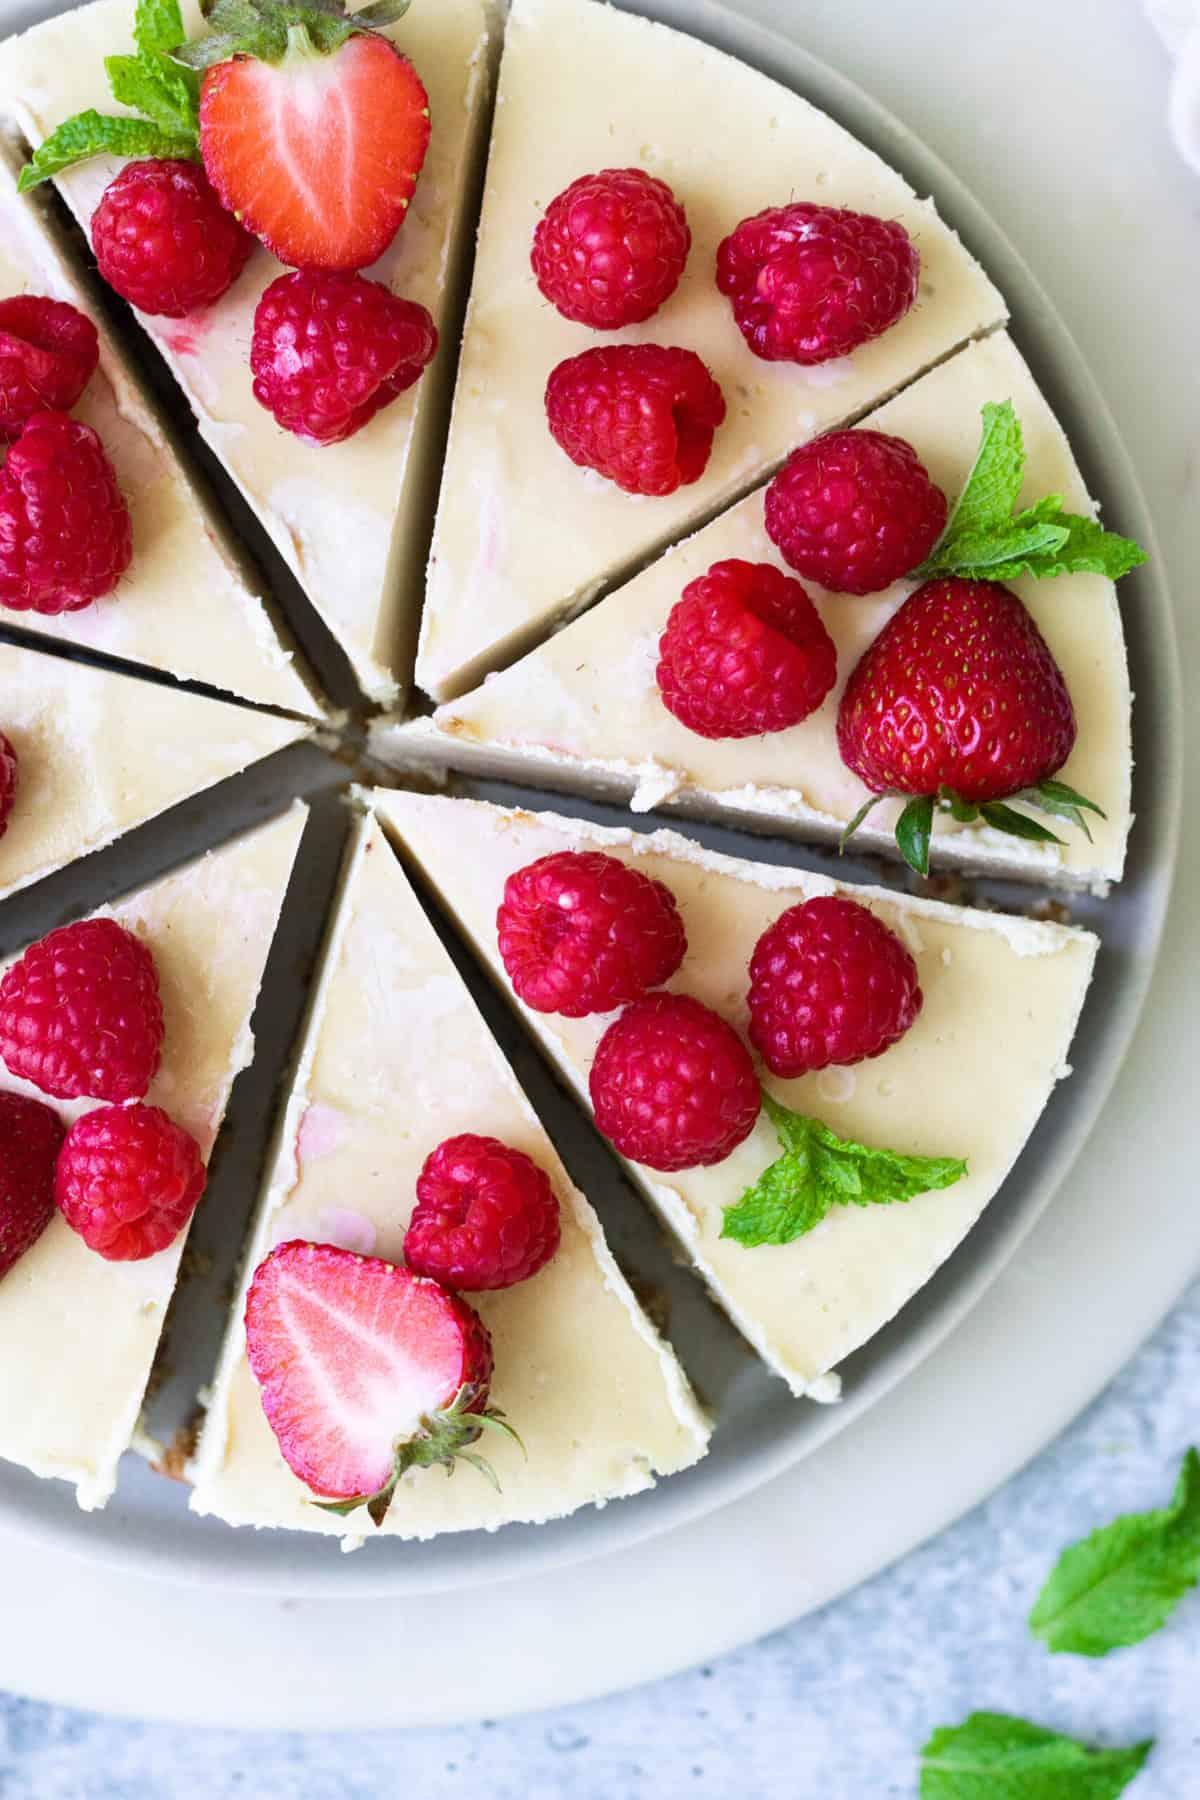 Easy Healthy No-Bake Cheesecake